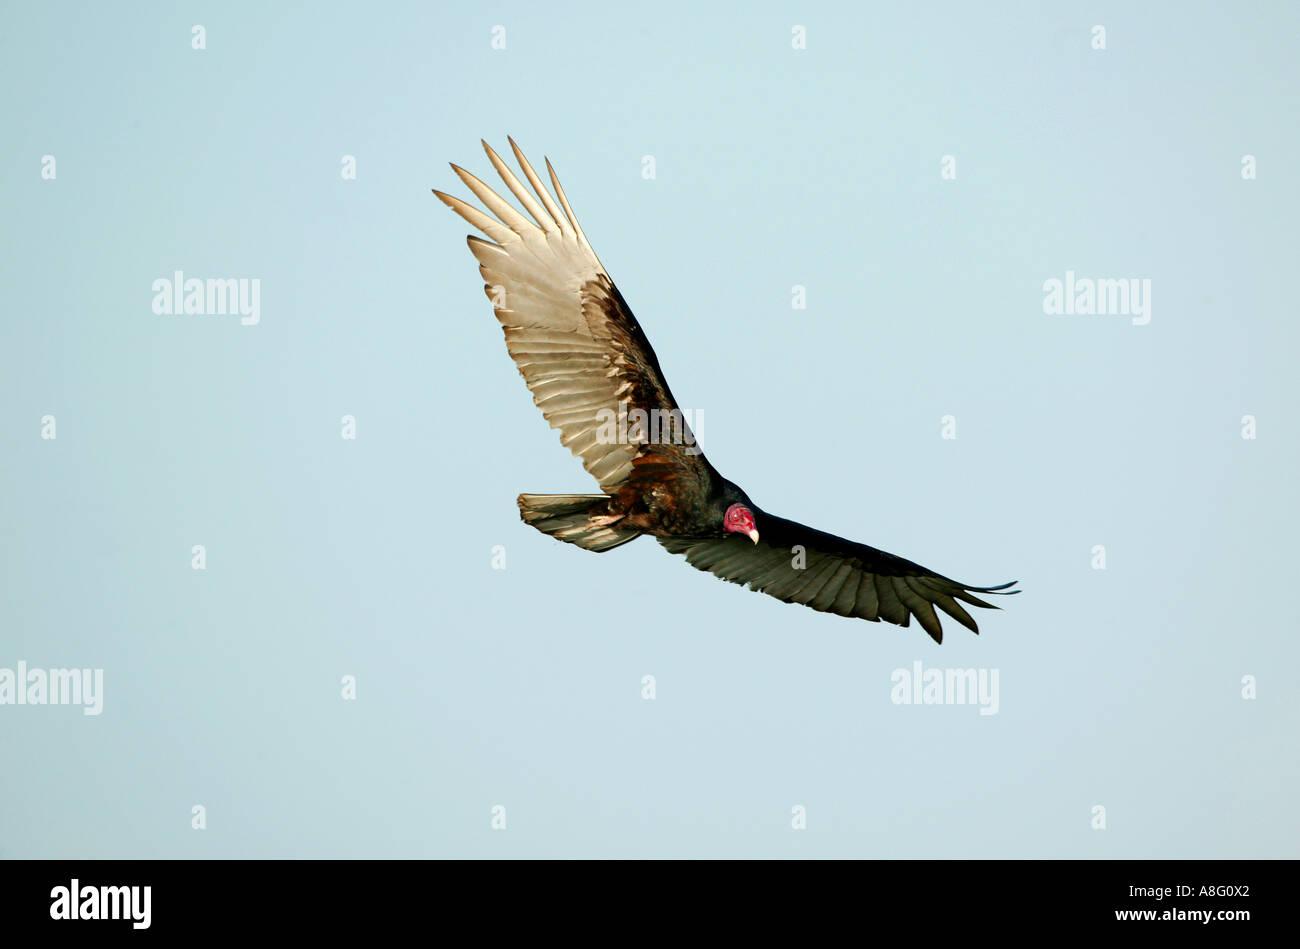 Turkey Vulture, Cathartes aura, over the rainforest of Soberania national park, Republic of Panama. - Stock Image